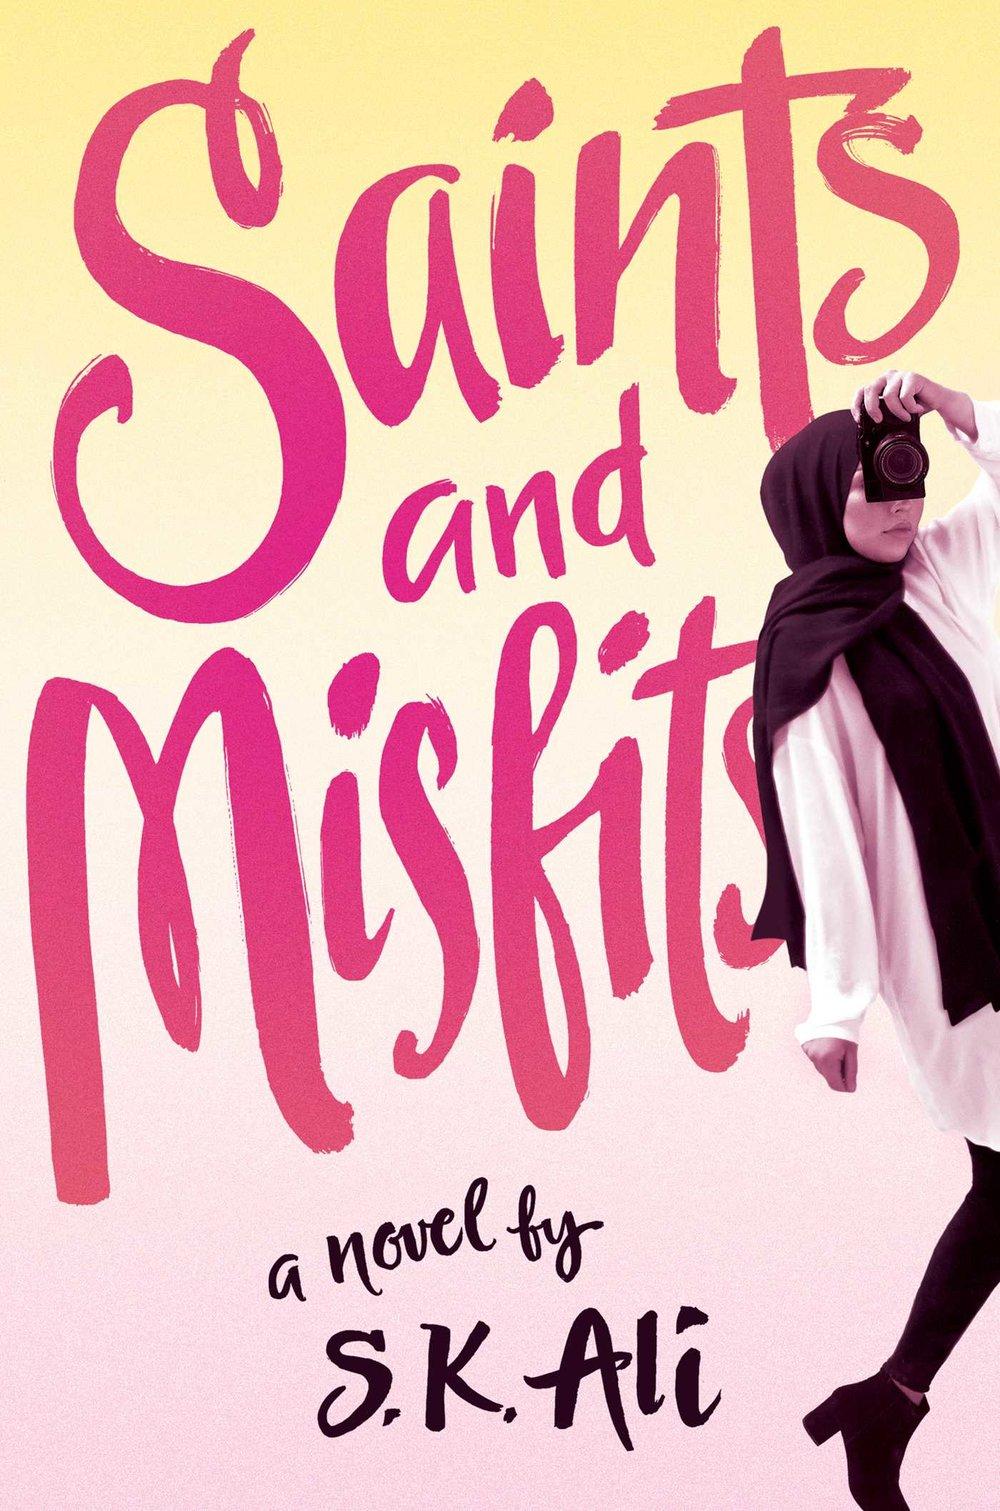 Saints and Misfits, by S.K. Ali